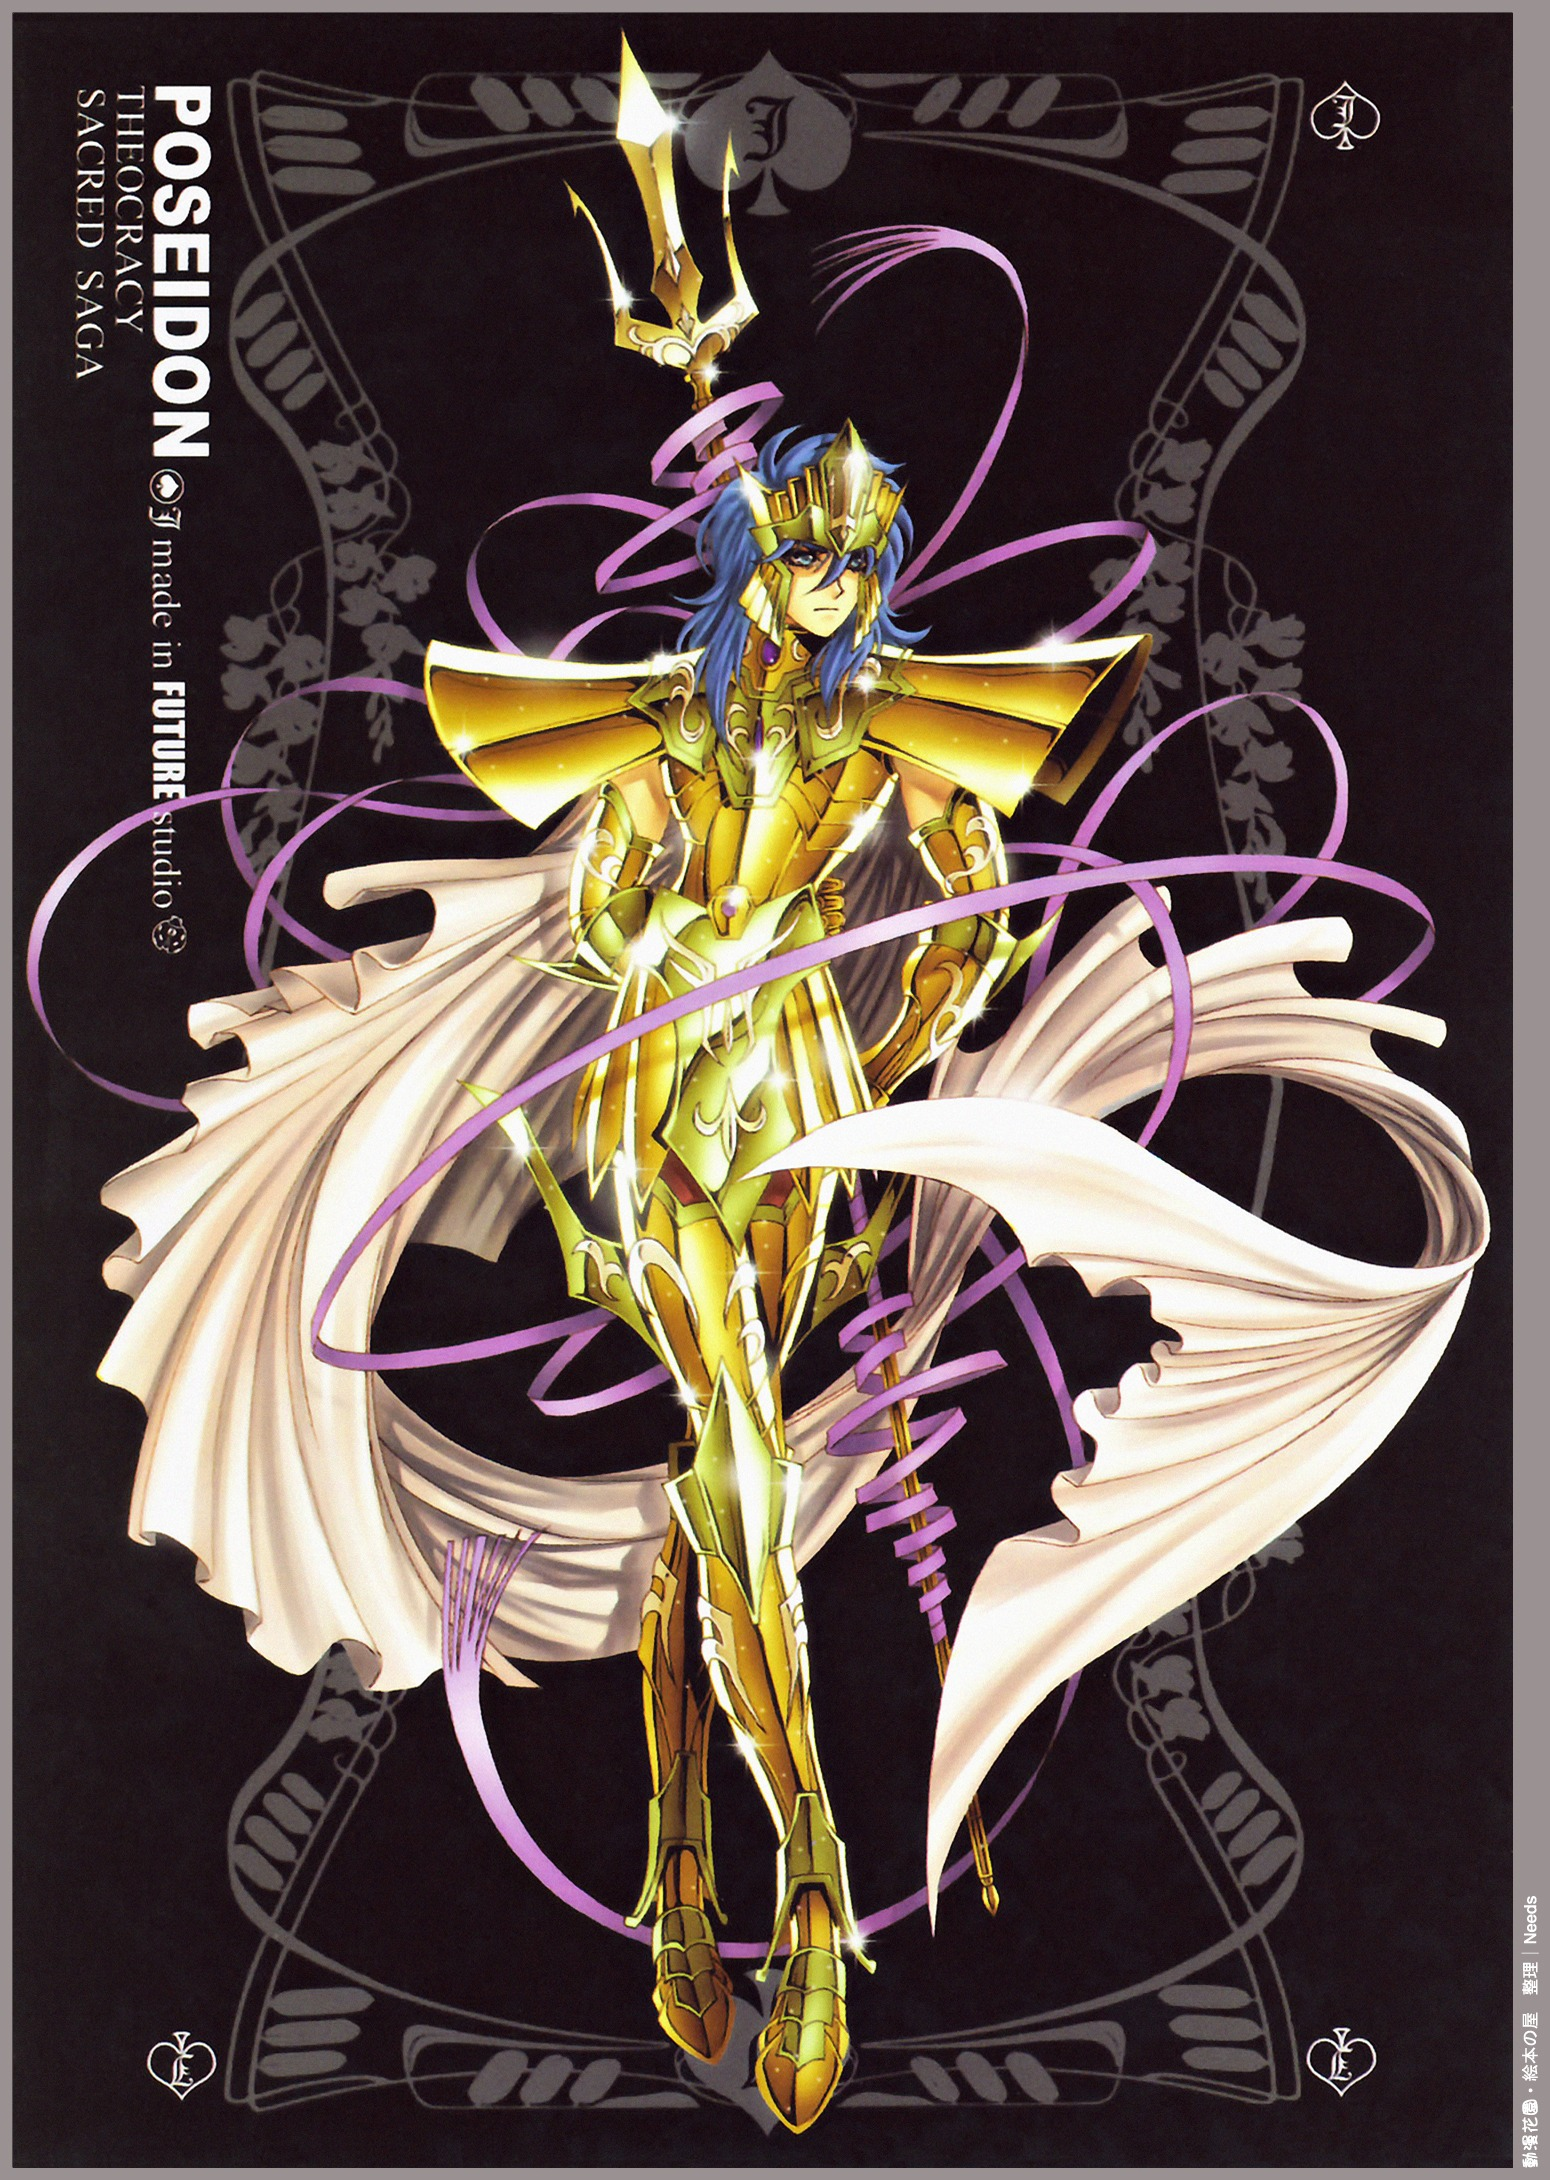 Poseidon (Saint Seiya) Mobile Wallpaper #631726 - Zerochan